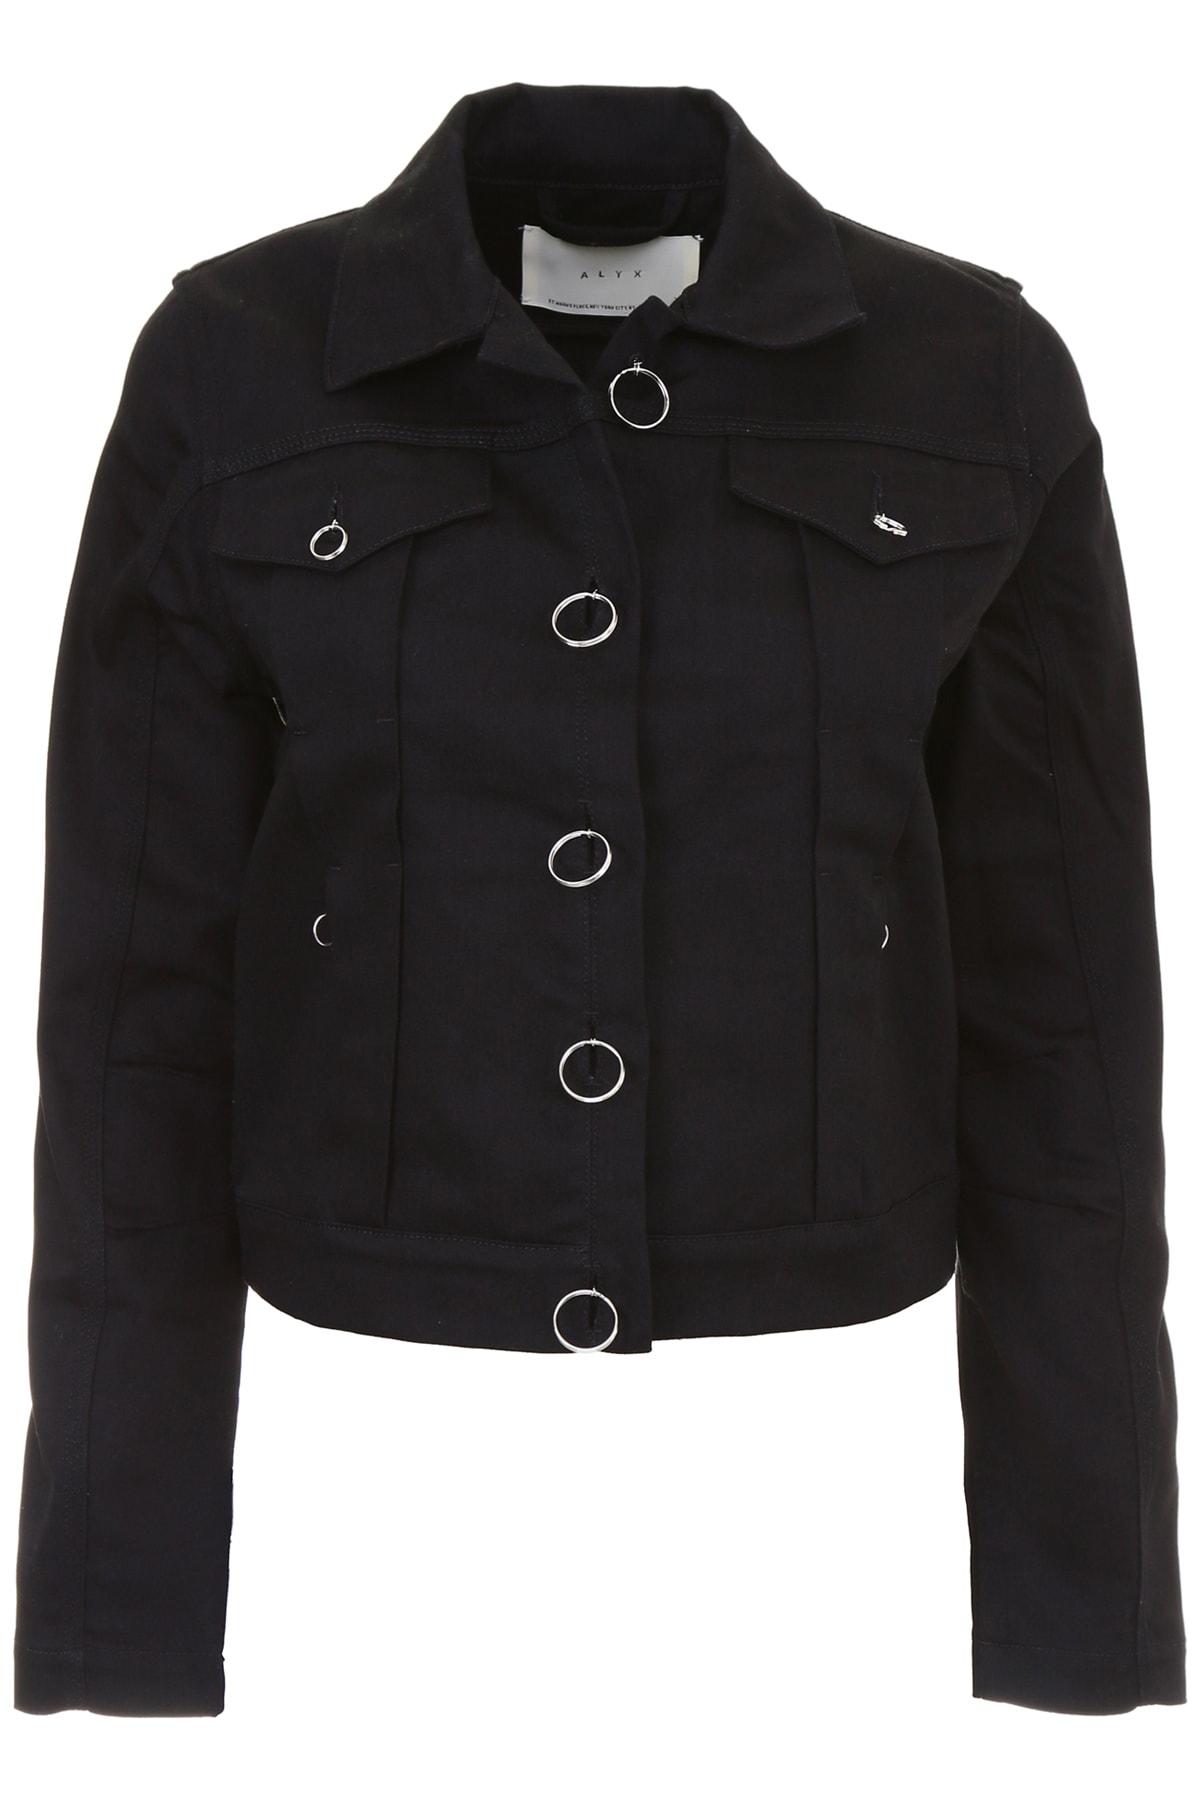 Alyx Denim Jacket